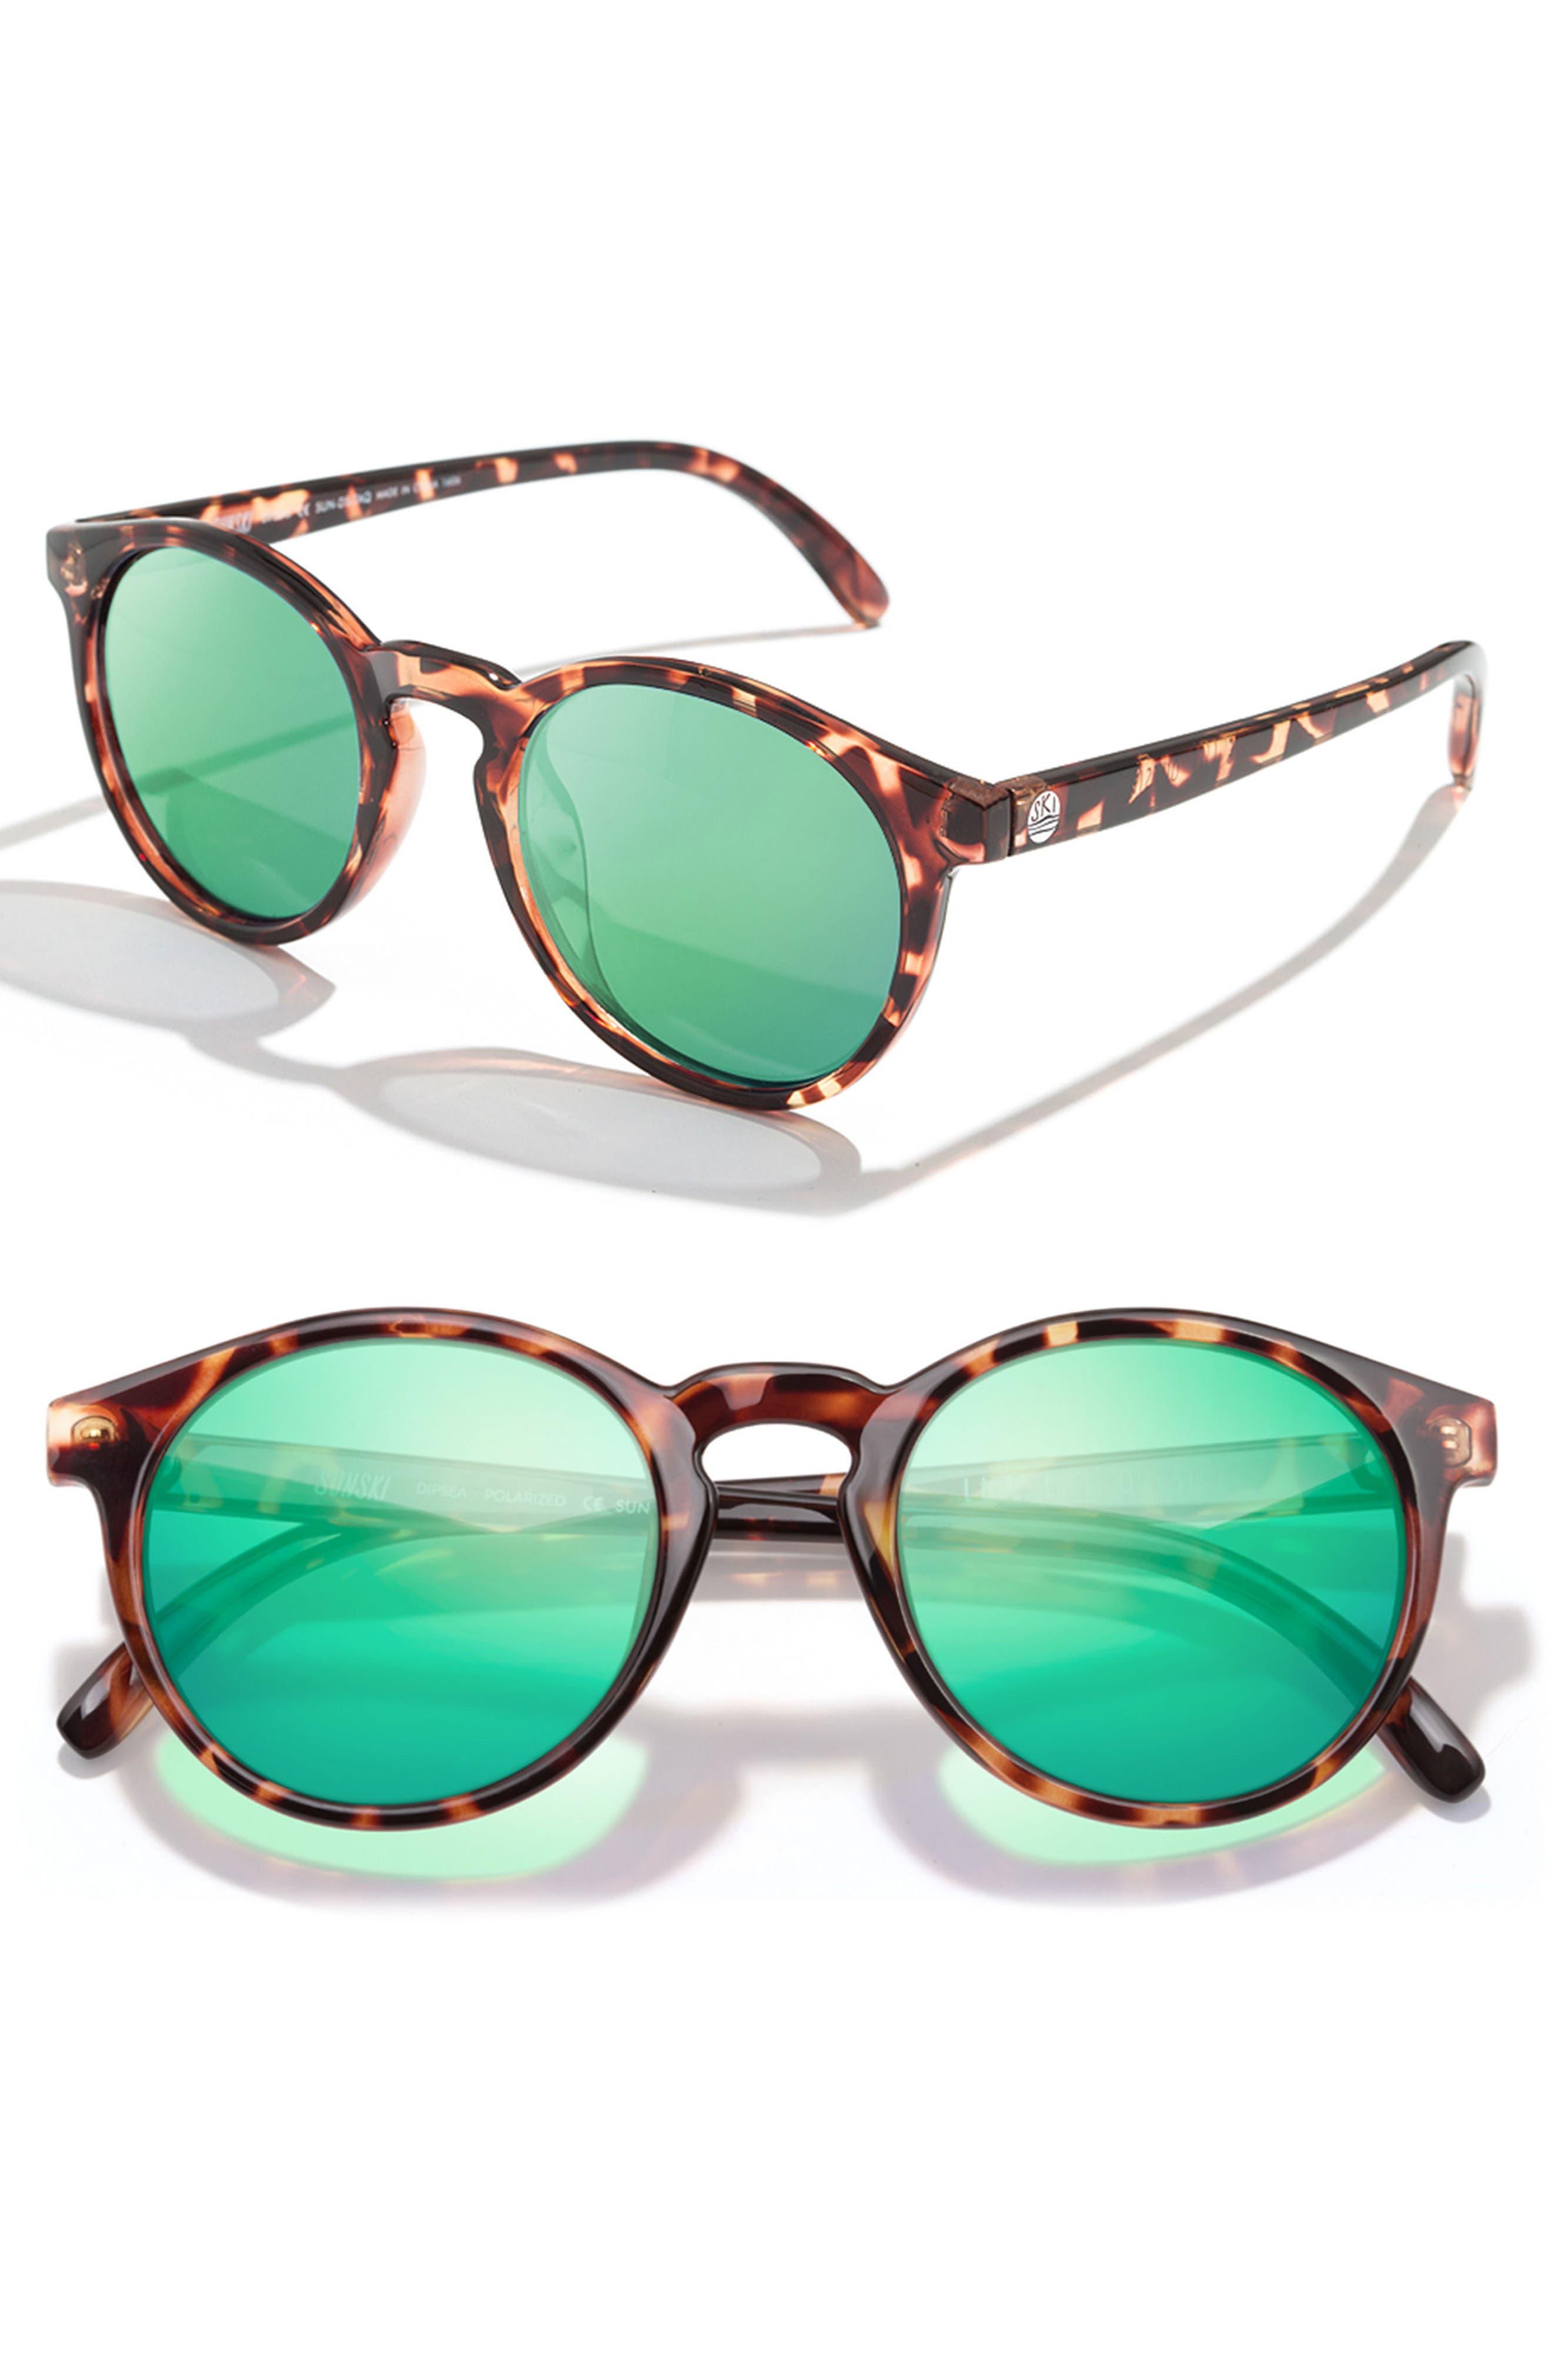 Dipsea 48mm Polarized Sunglasses,                         Main,                         color, Tortoise Emerald